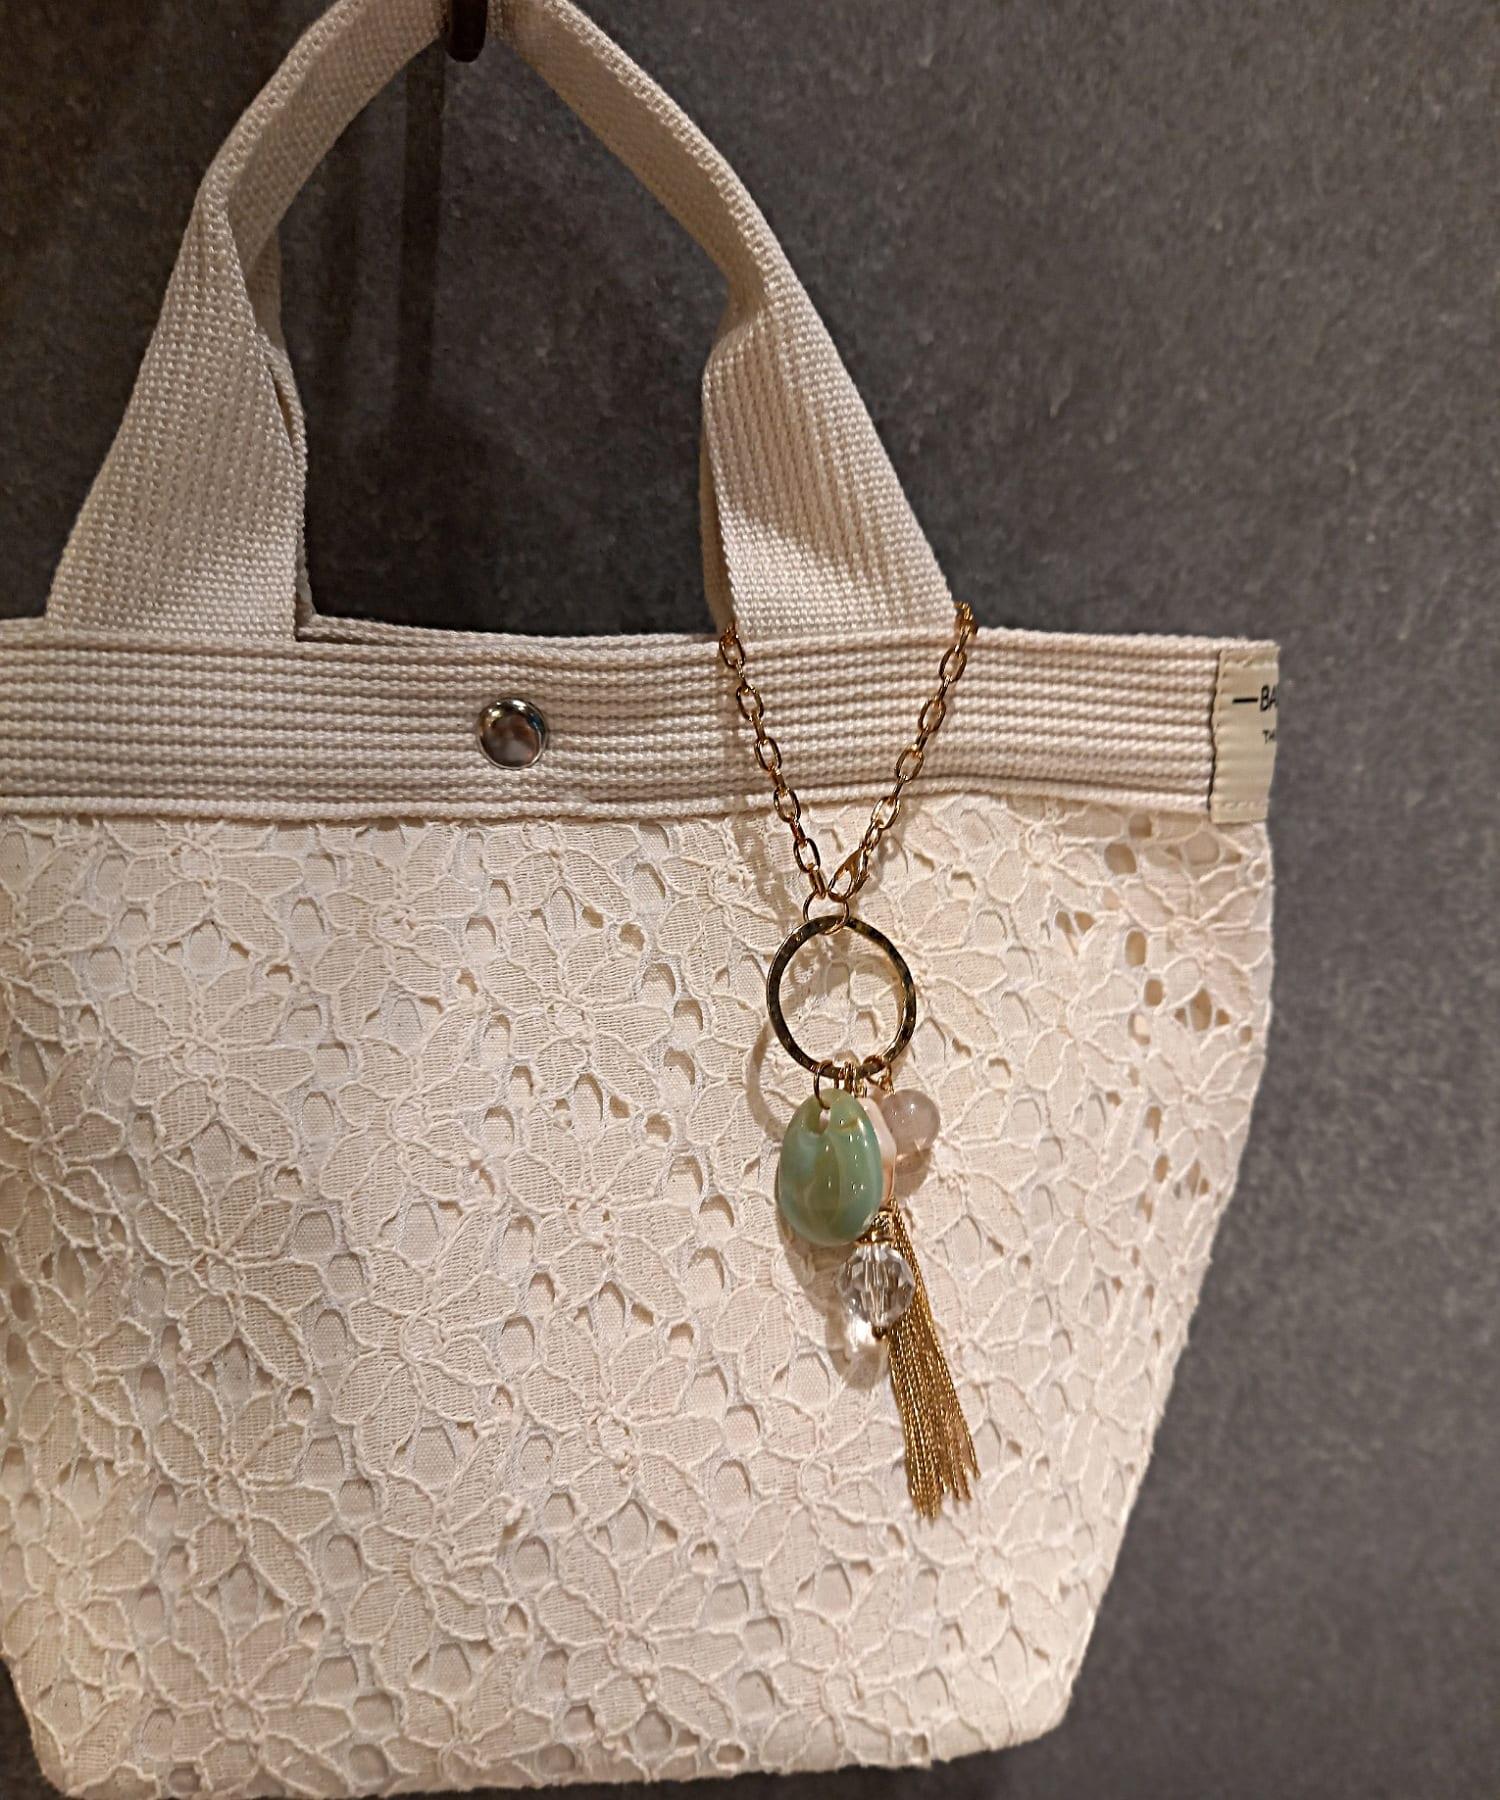 Pal collection(パルコレクション) 《Bag Charm》メタルフリンジチャーム